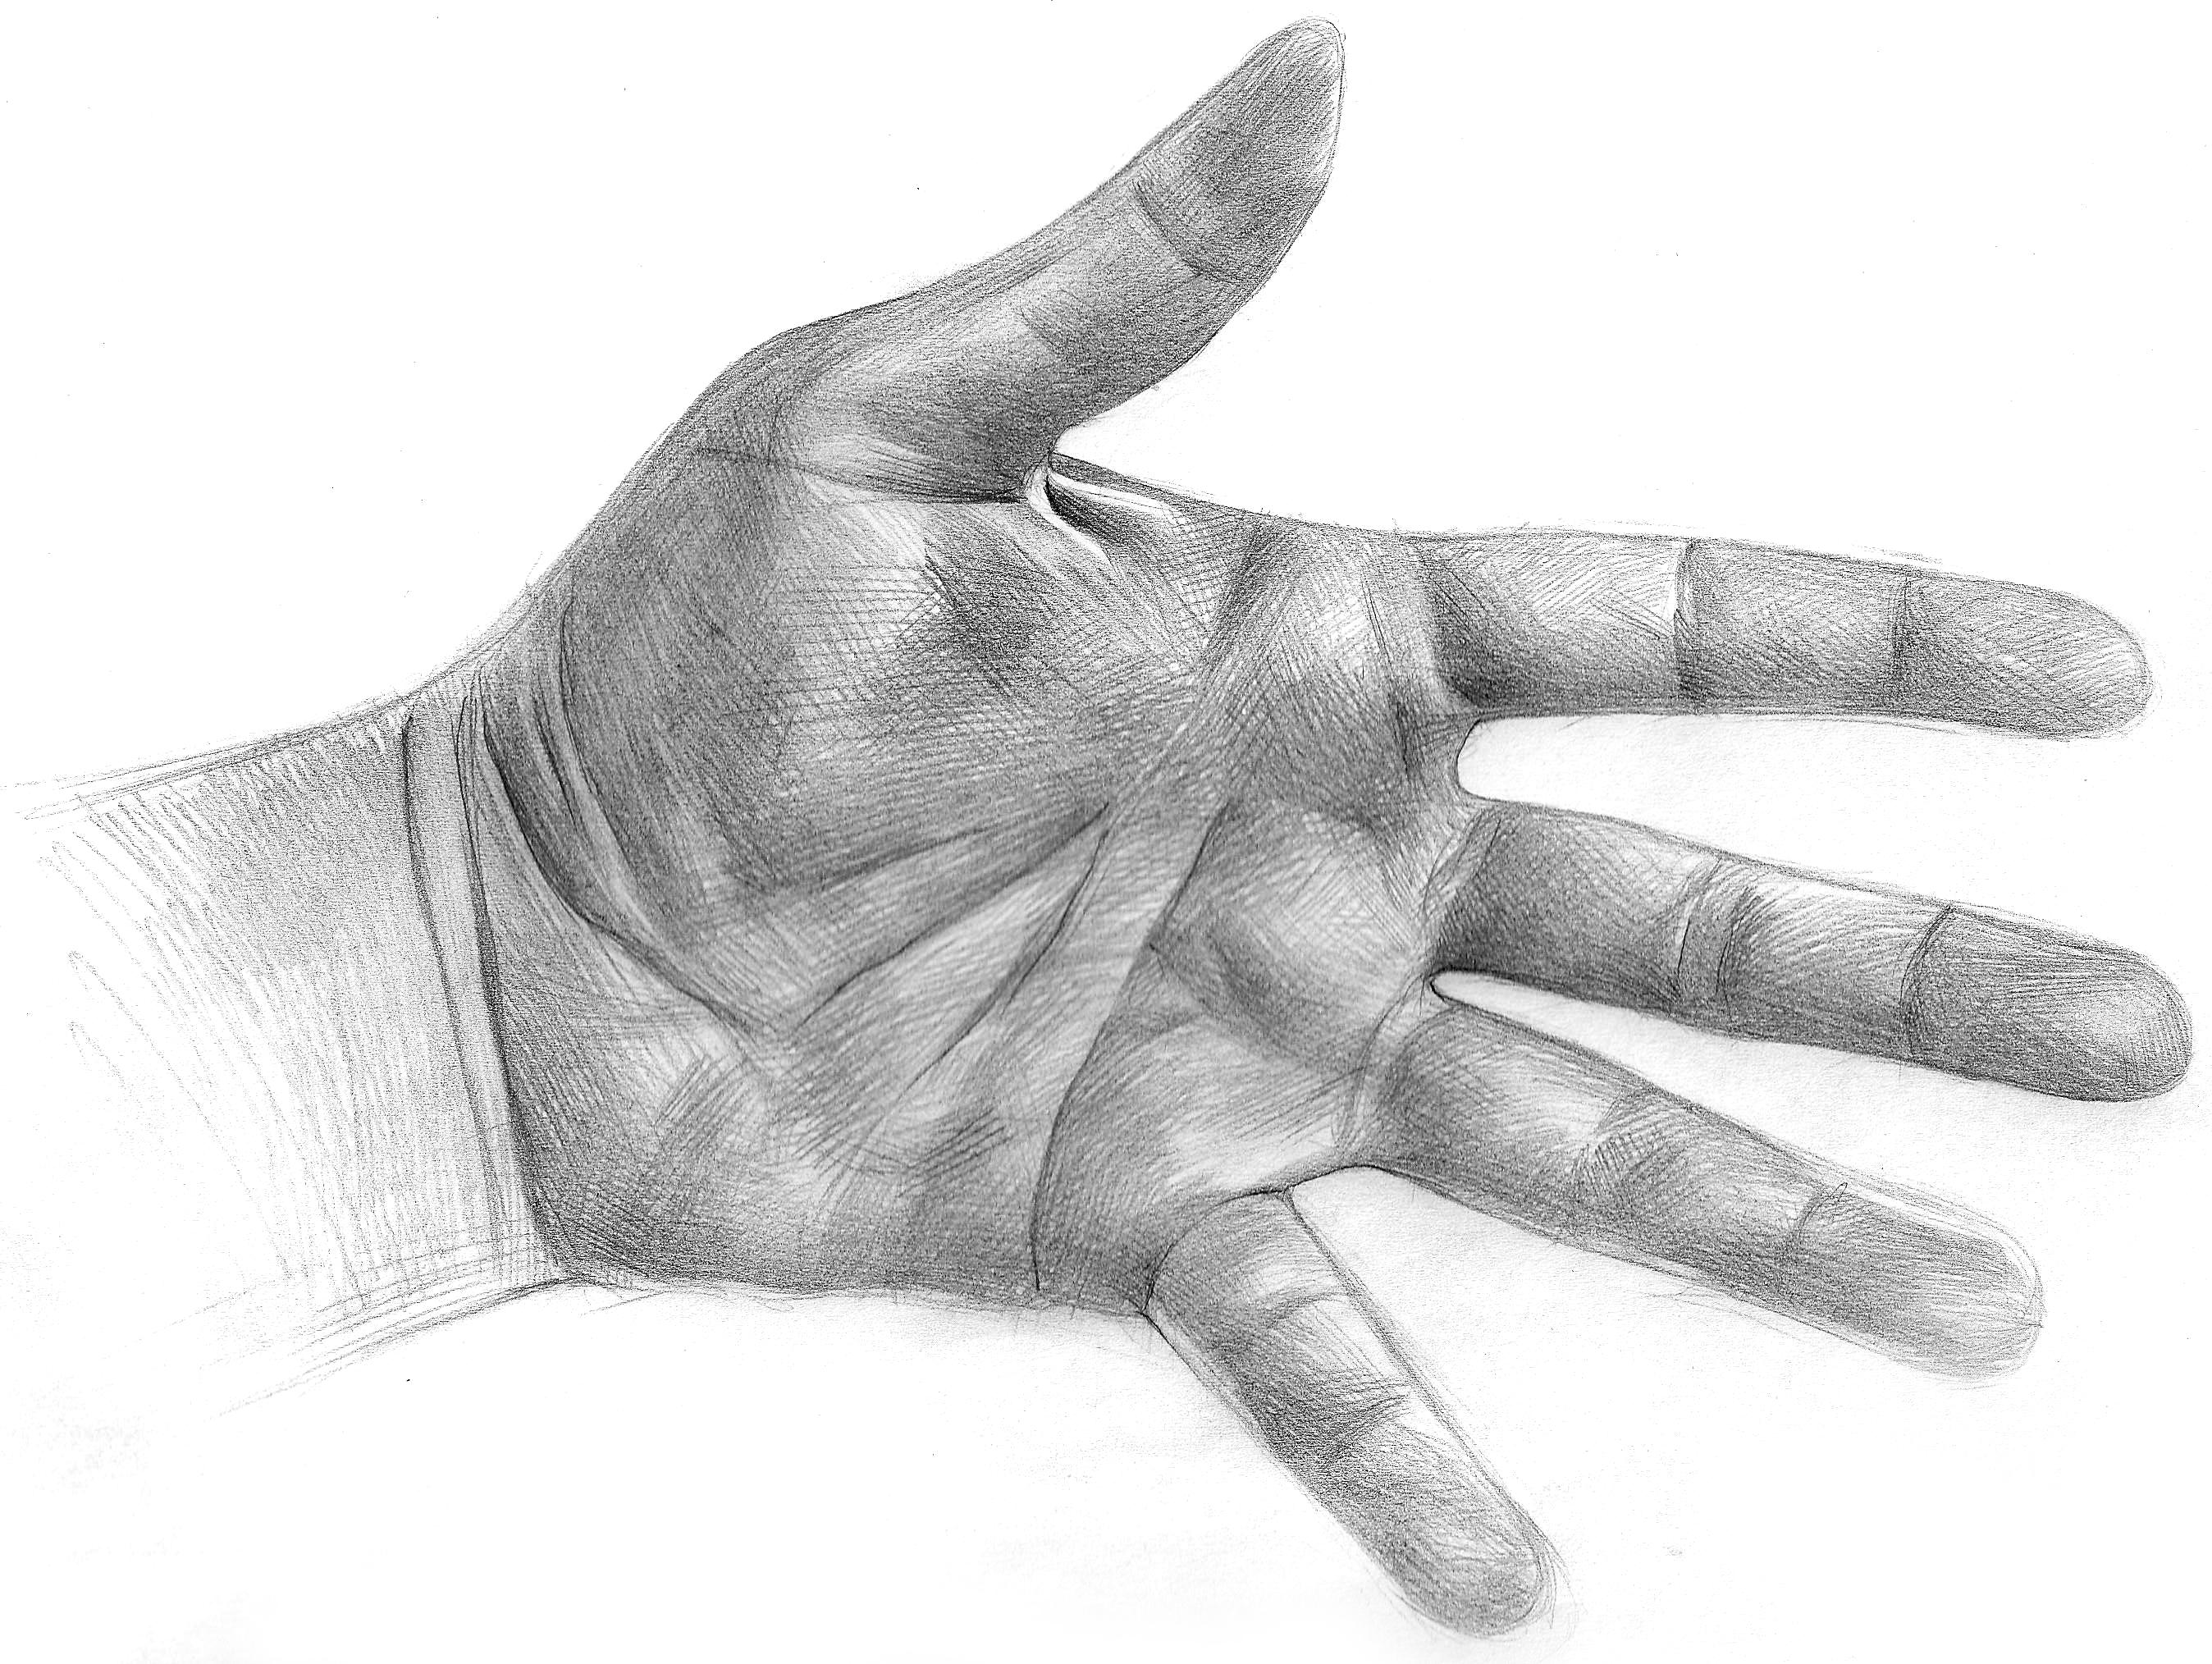 Hand Sketch on Sketch Art Of Sanchez